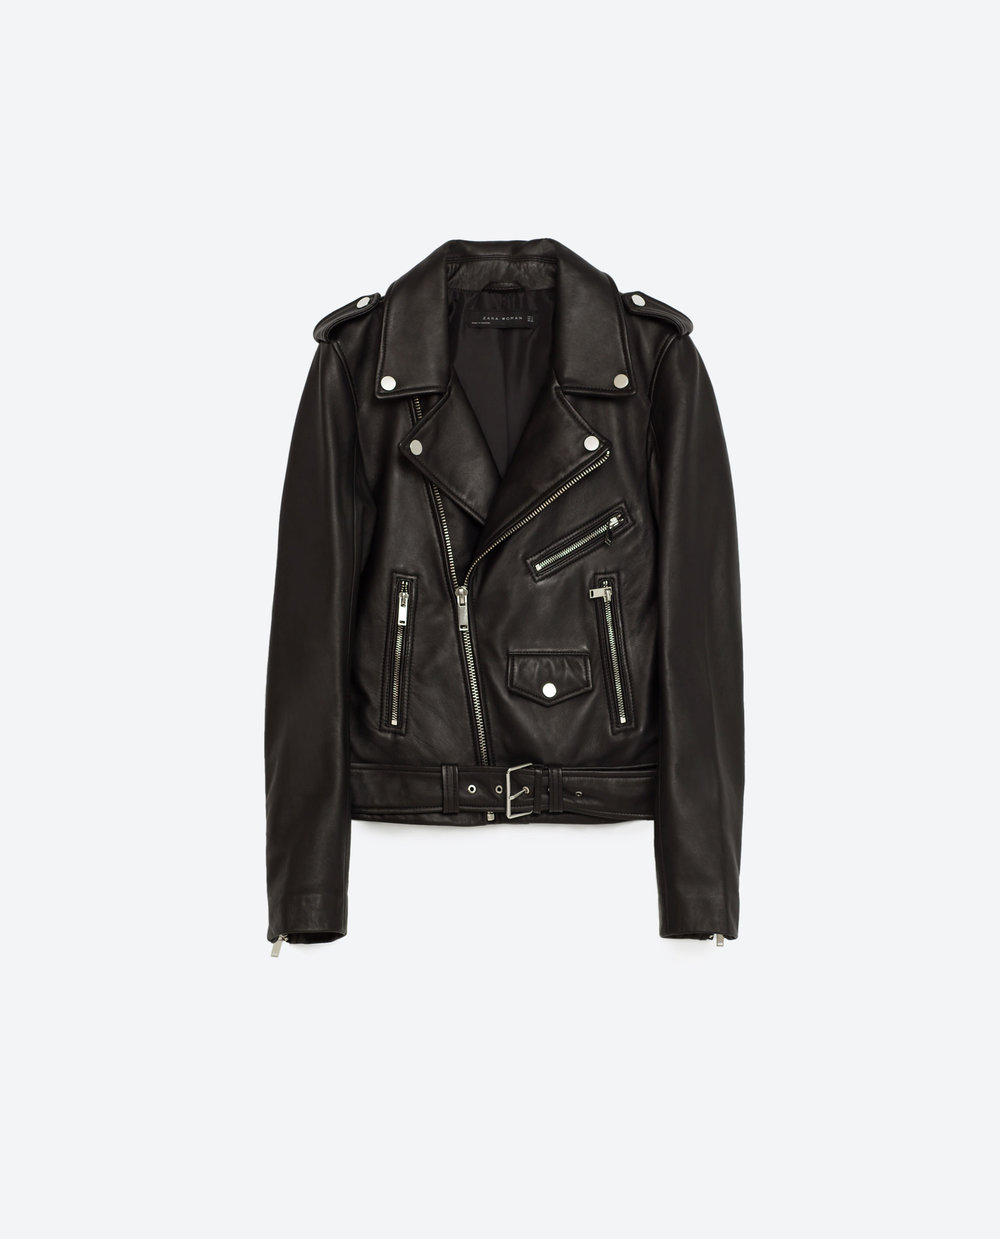 Zara: leather jacket, £119